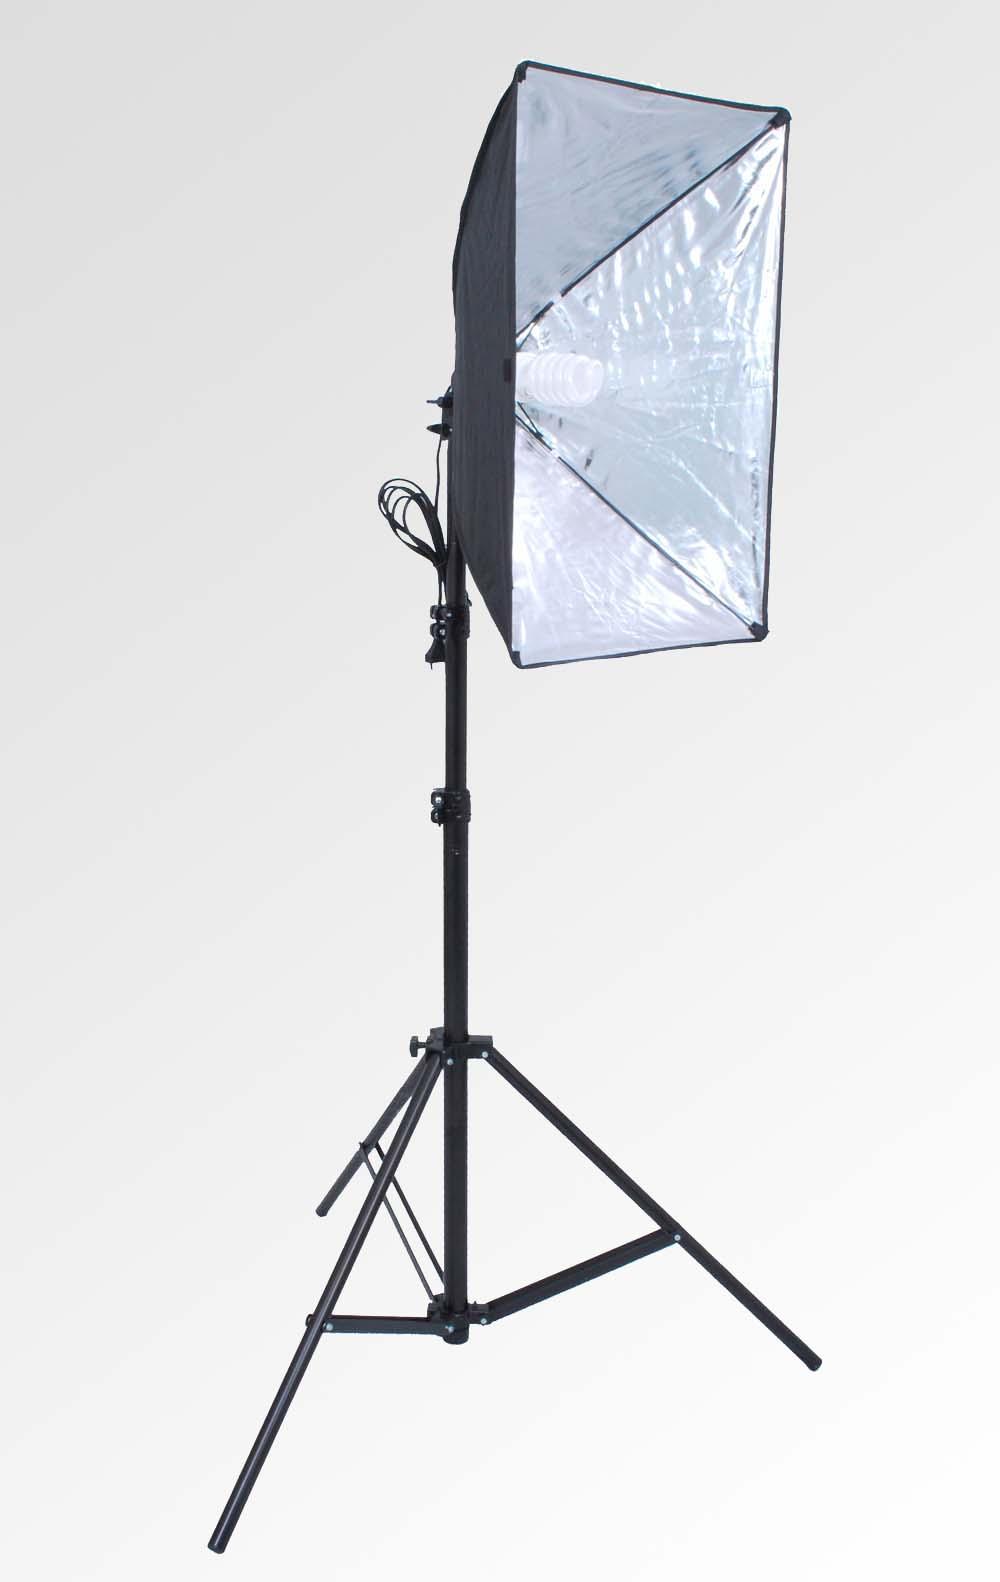 esmart germany foto schnellstart energiesparlampe 50 w. Black Bedroom Furniture Sets. Home Design Ideas